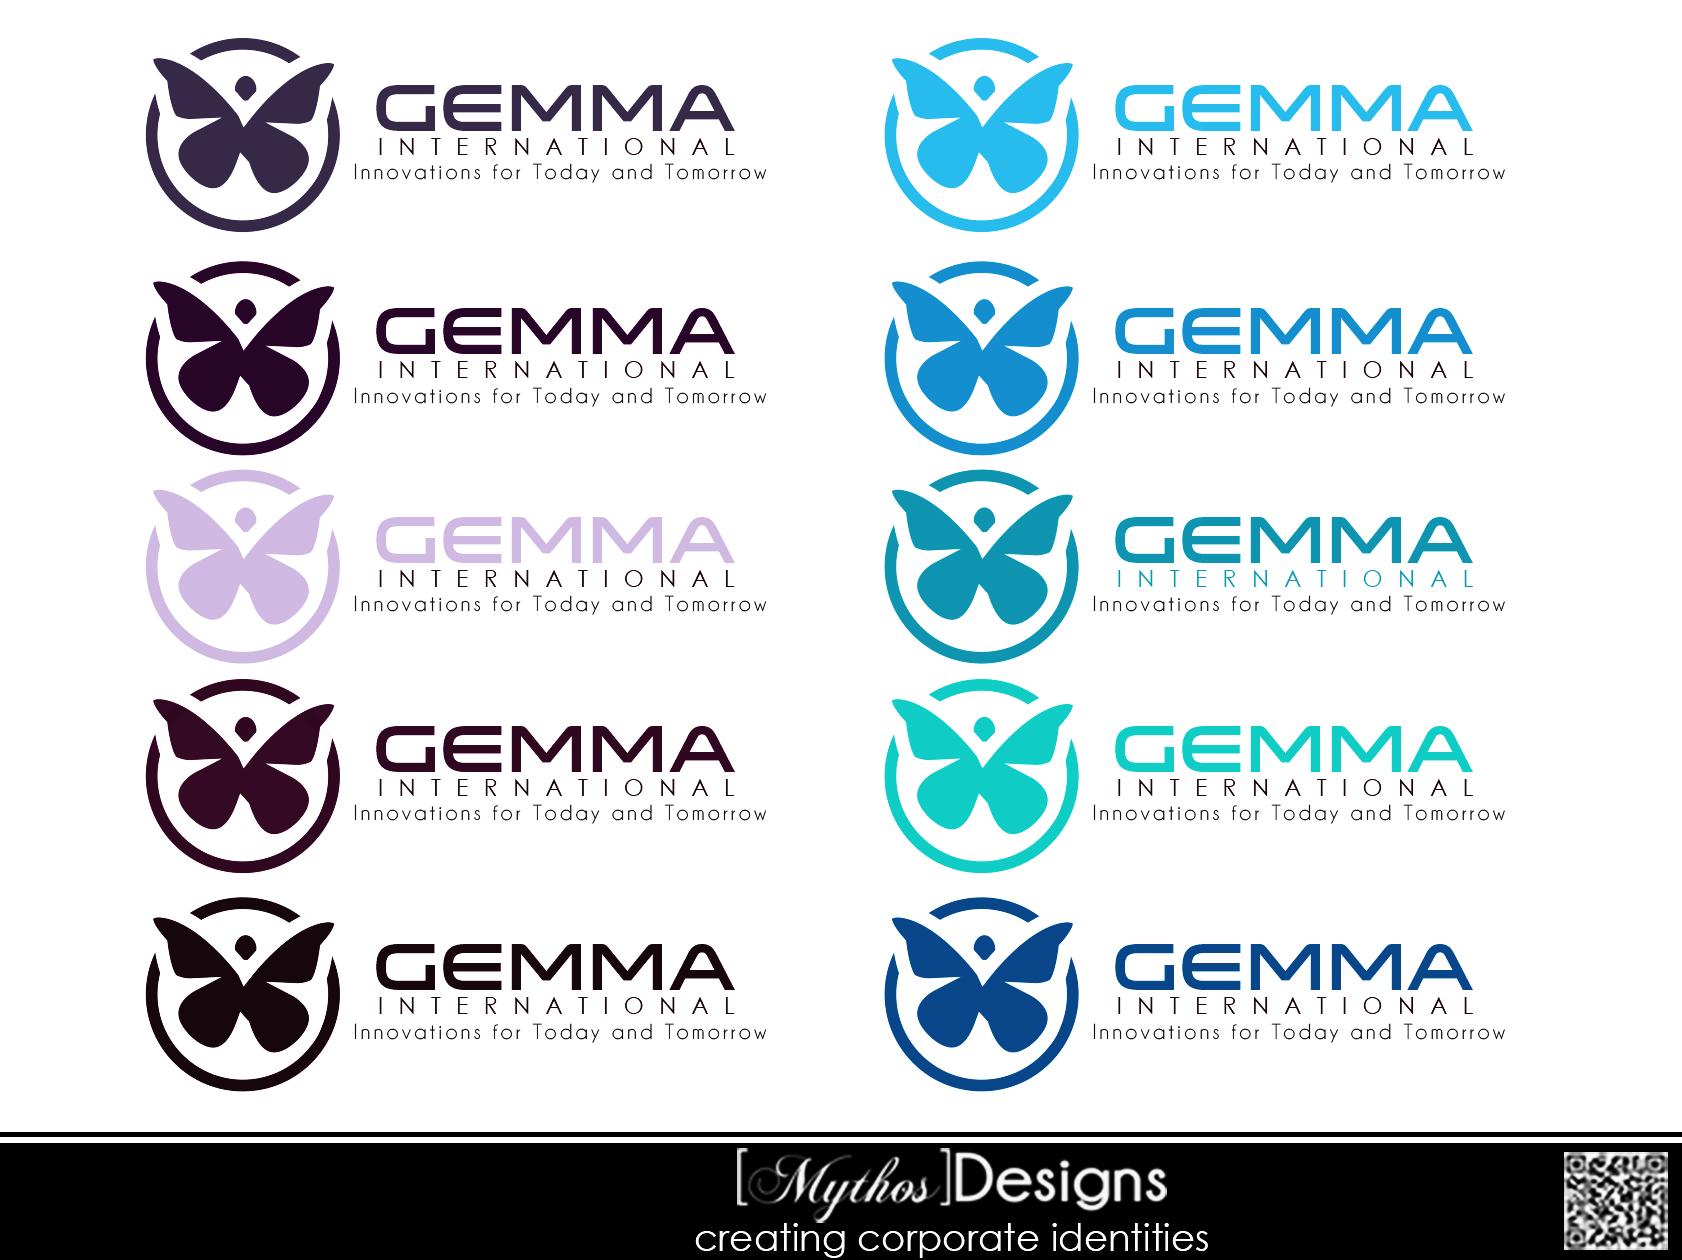 Logo Design by Mythos Designs - Entry No. 66 in the Logo Design Contest Artistic Logo Design for Gemma International.